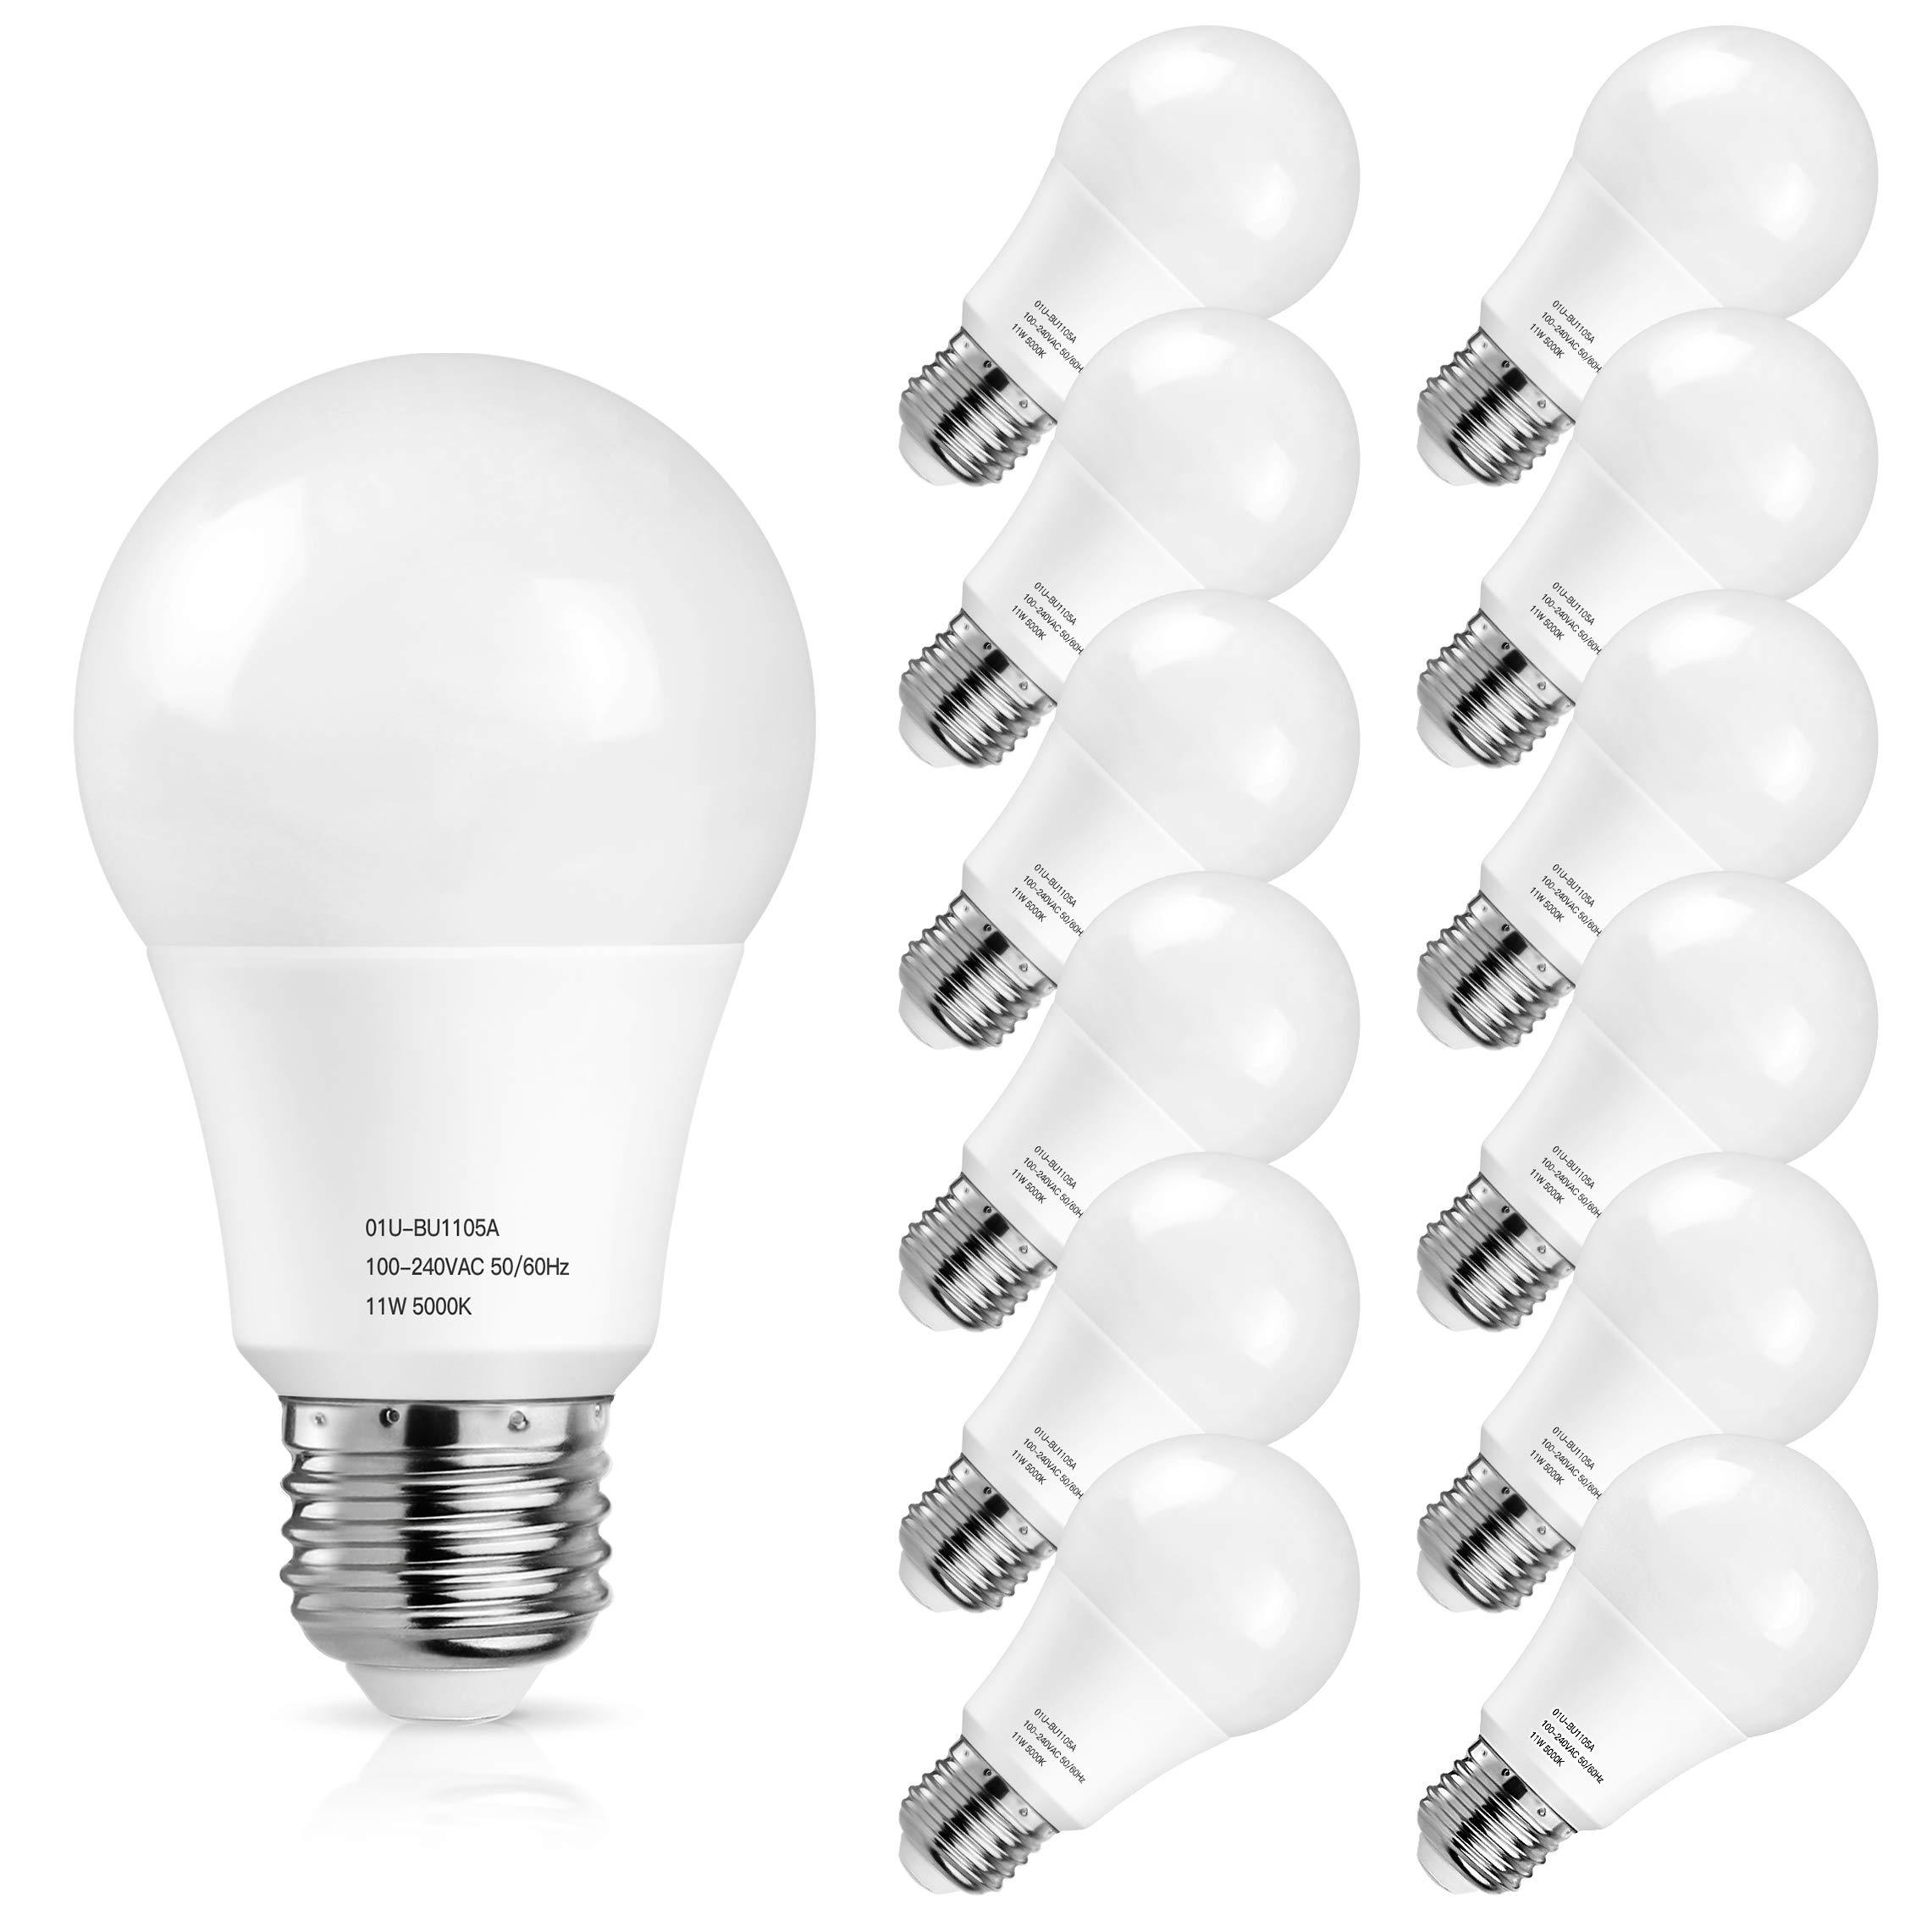 A19 LED Light Bulbs 5000K, 100 Watt Equivalent LED Bulb Daylight White, 1100Lumens, Non Dimmable, Medium Screw Base (E26), CRI80+, 12-Pack by MAXvolador (Image #1)